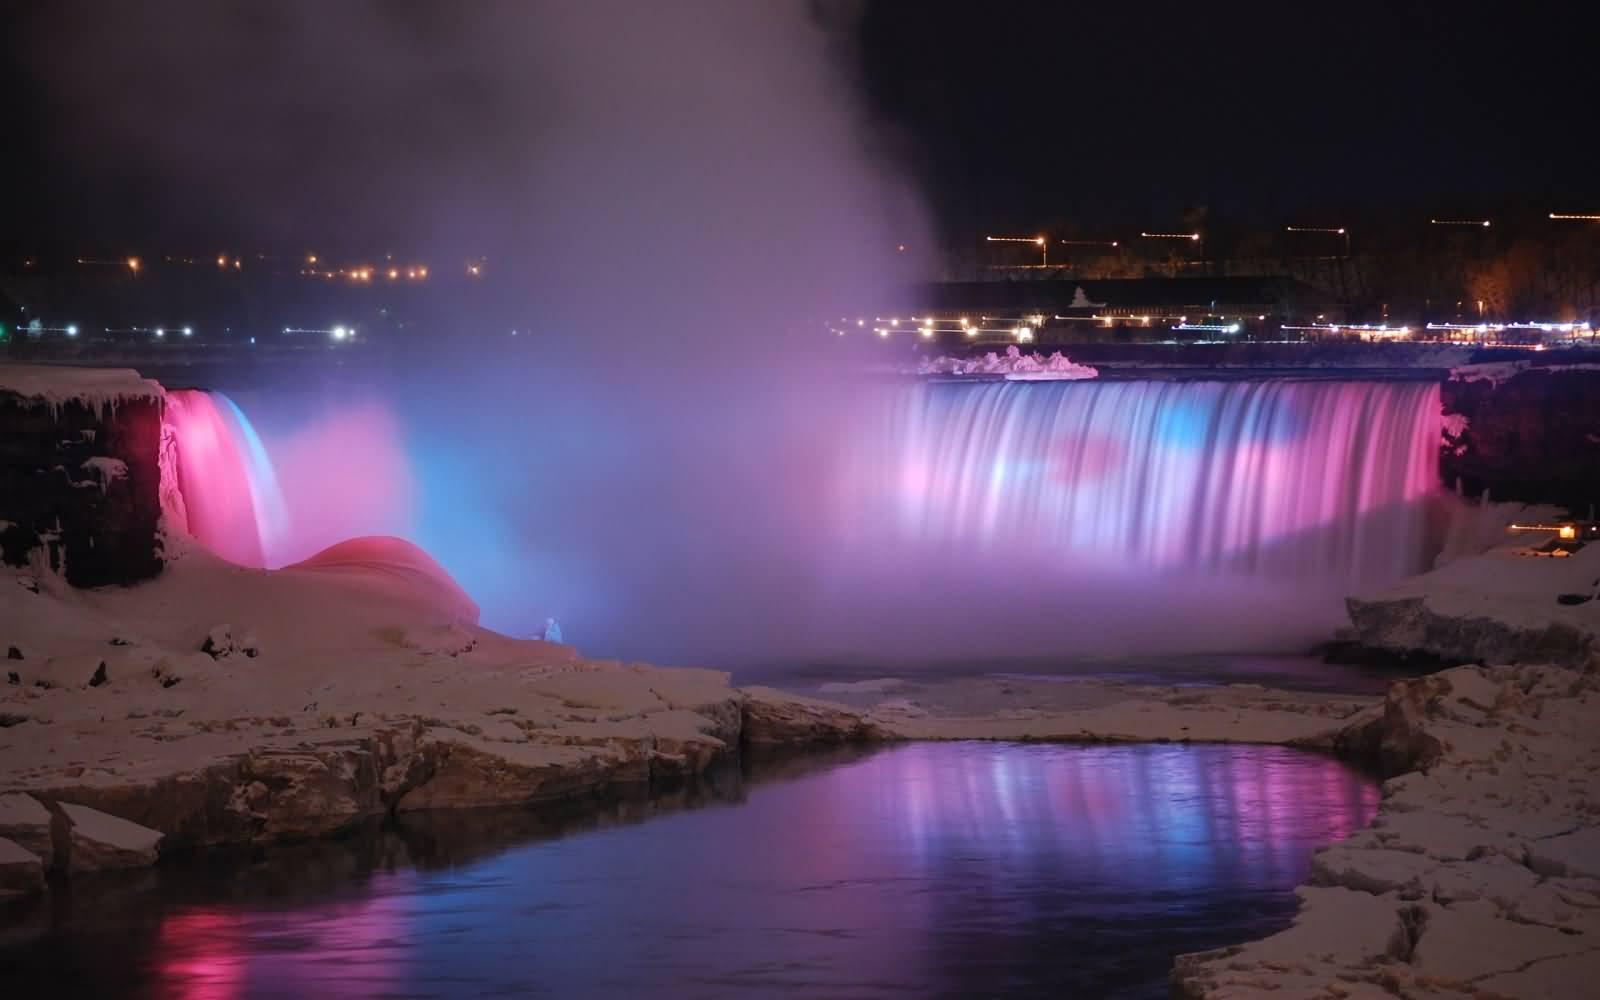 Niagara Falls Night Wallpaper Photos 40 Night View Pictures Of Niagara Falls